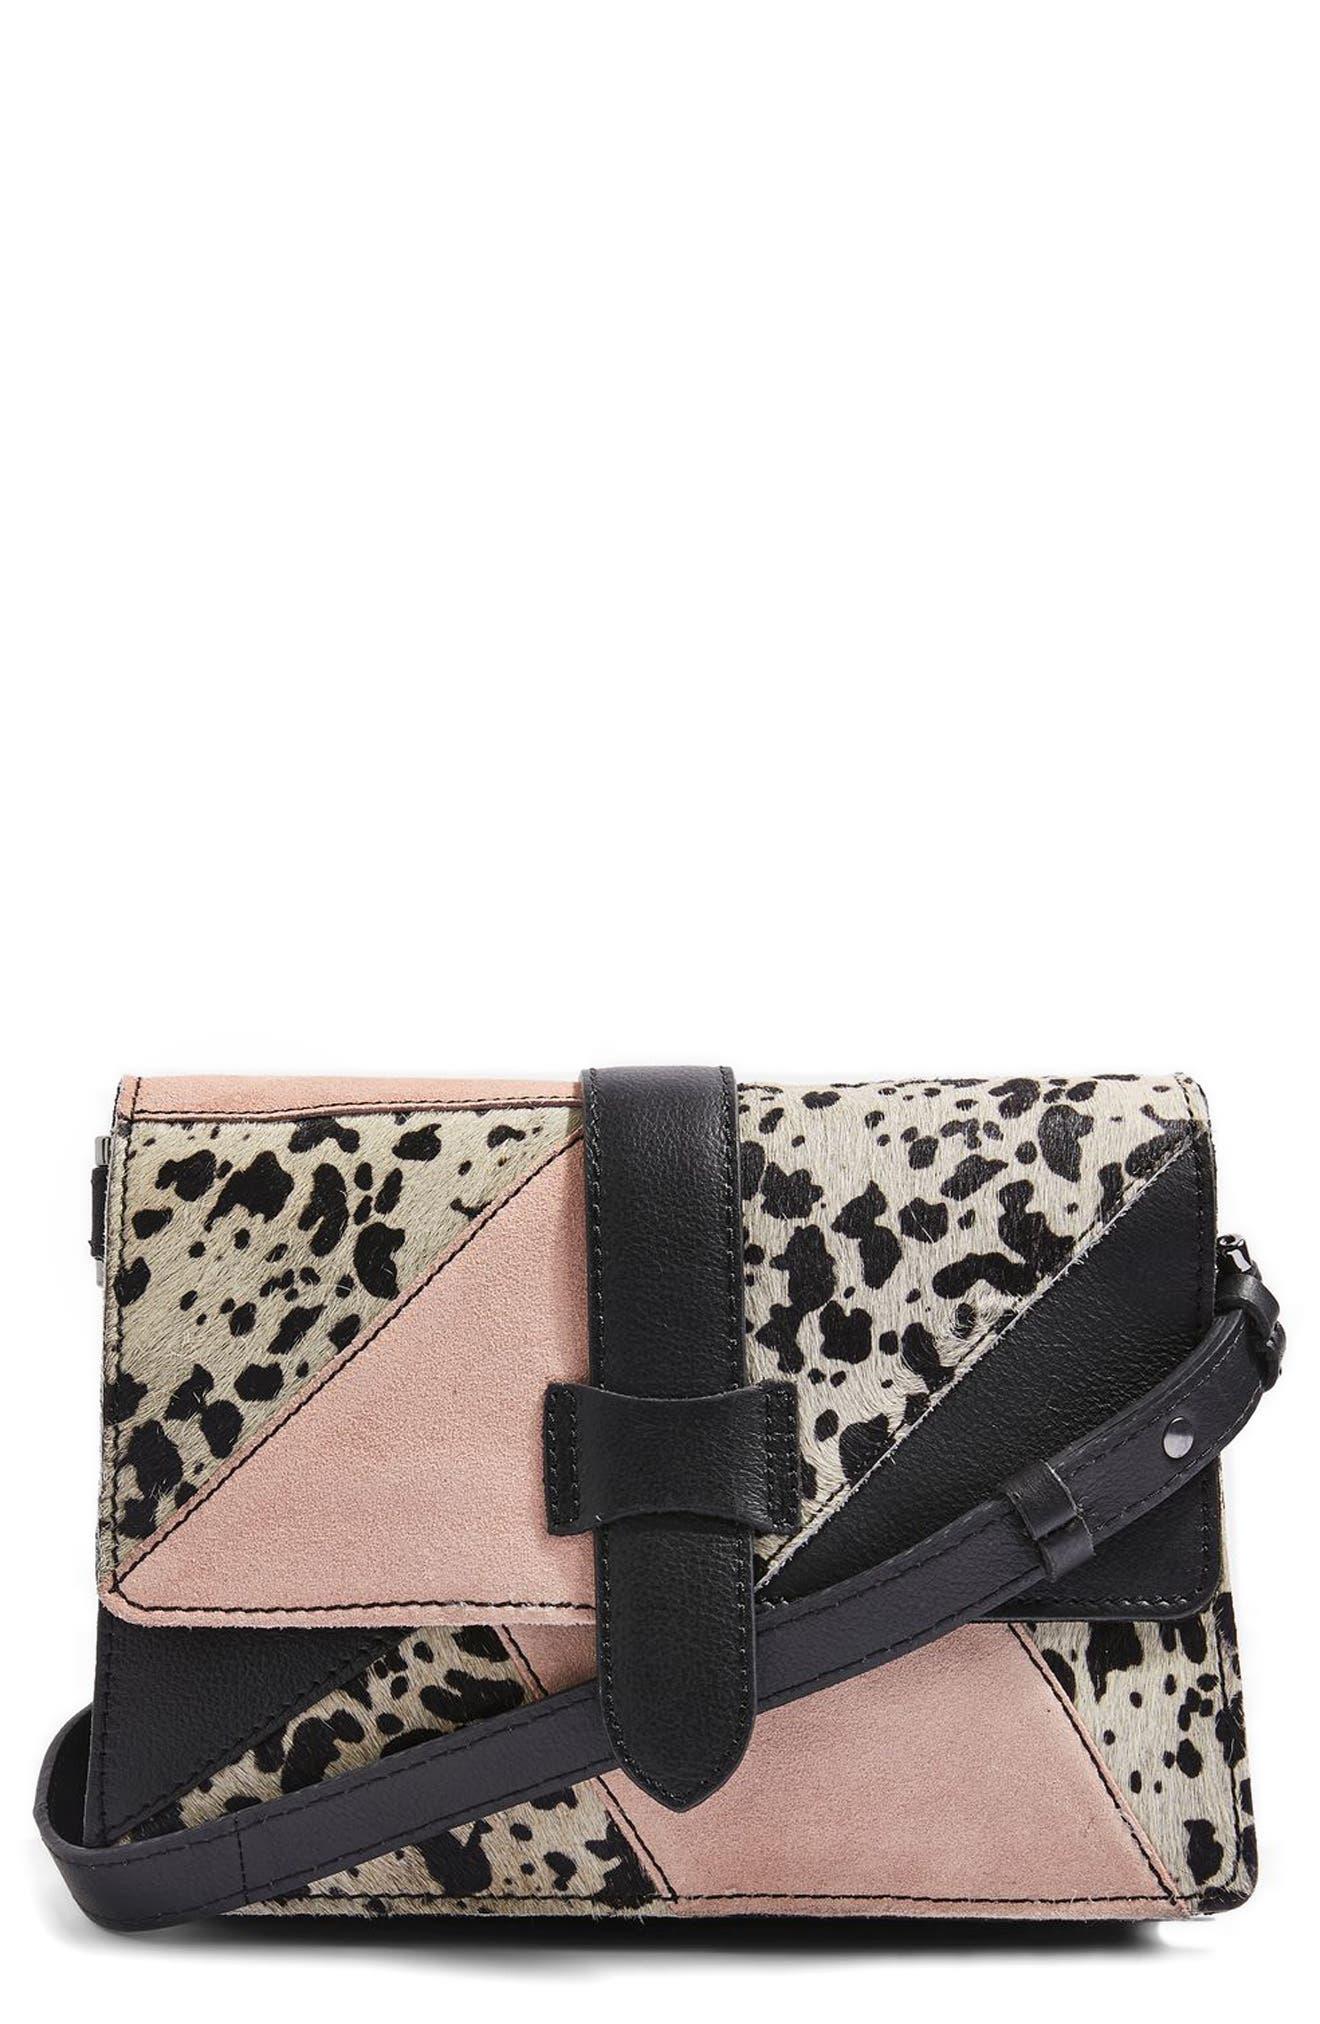 Premium Leather & Genuine Calf Hair Patchwork Crossbody Bag,                         Main,                         color, Black Multi